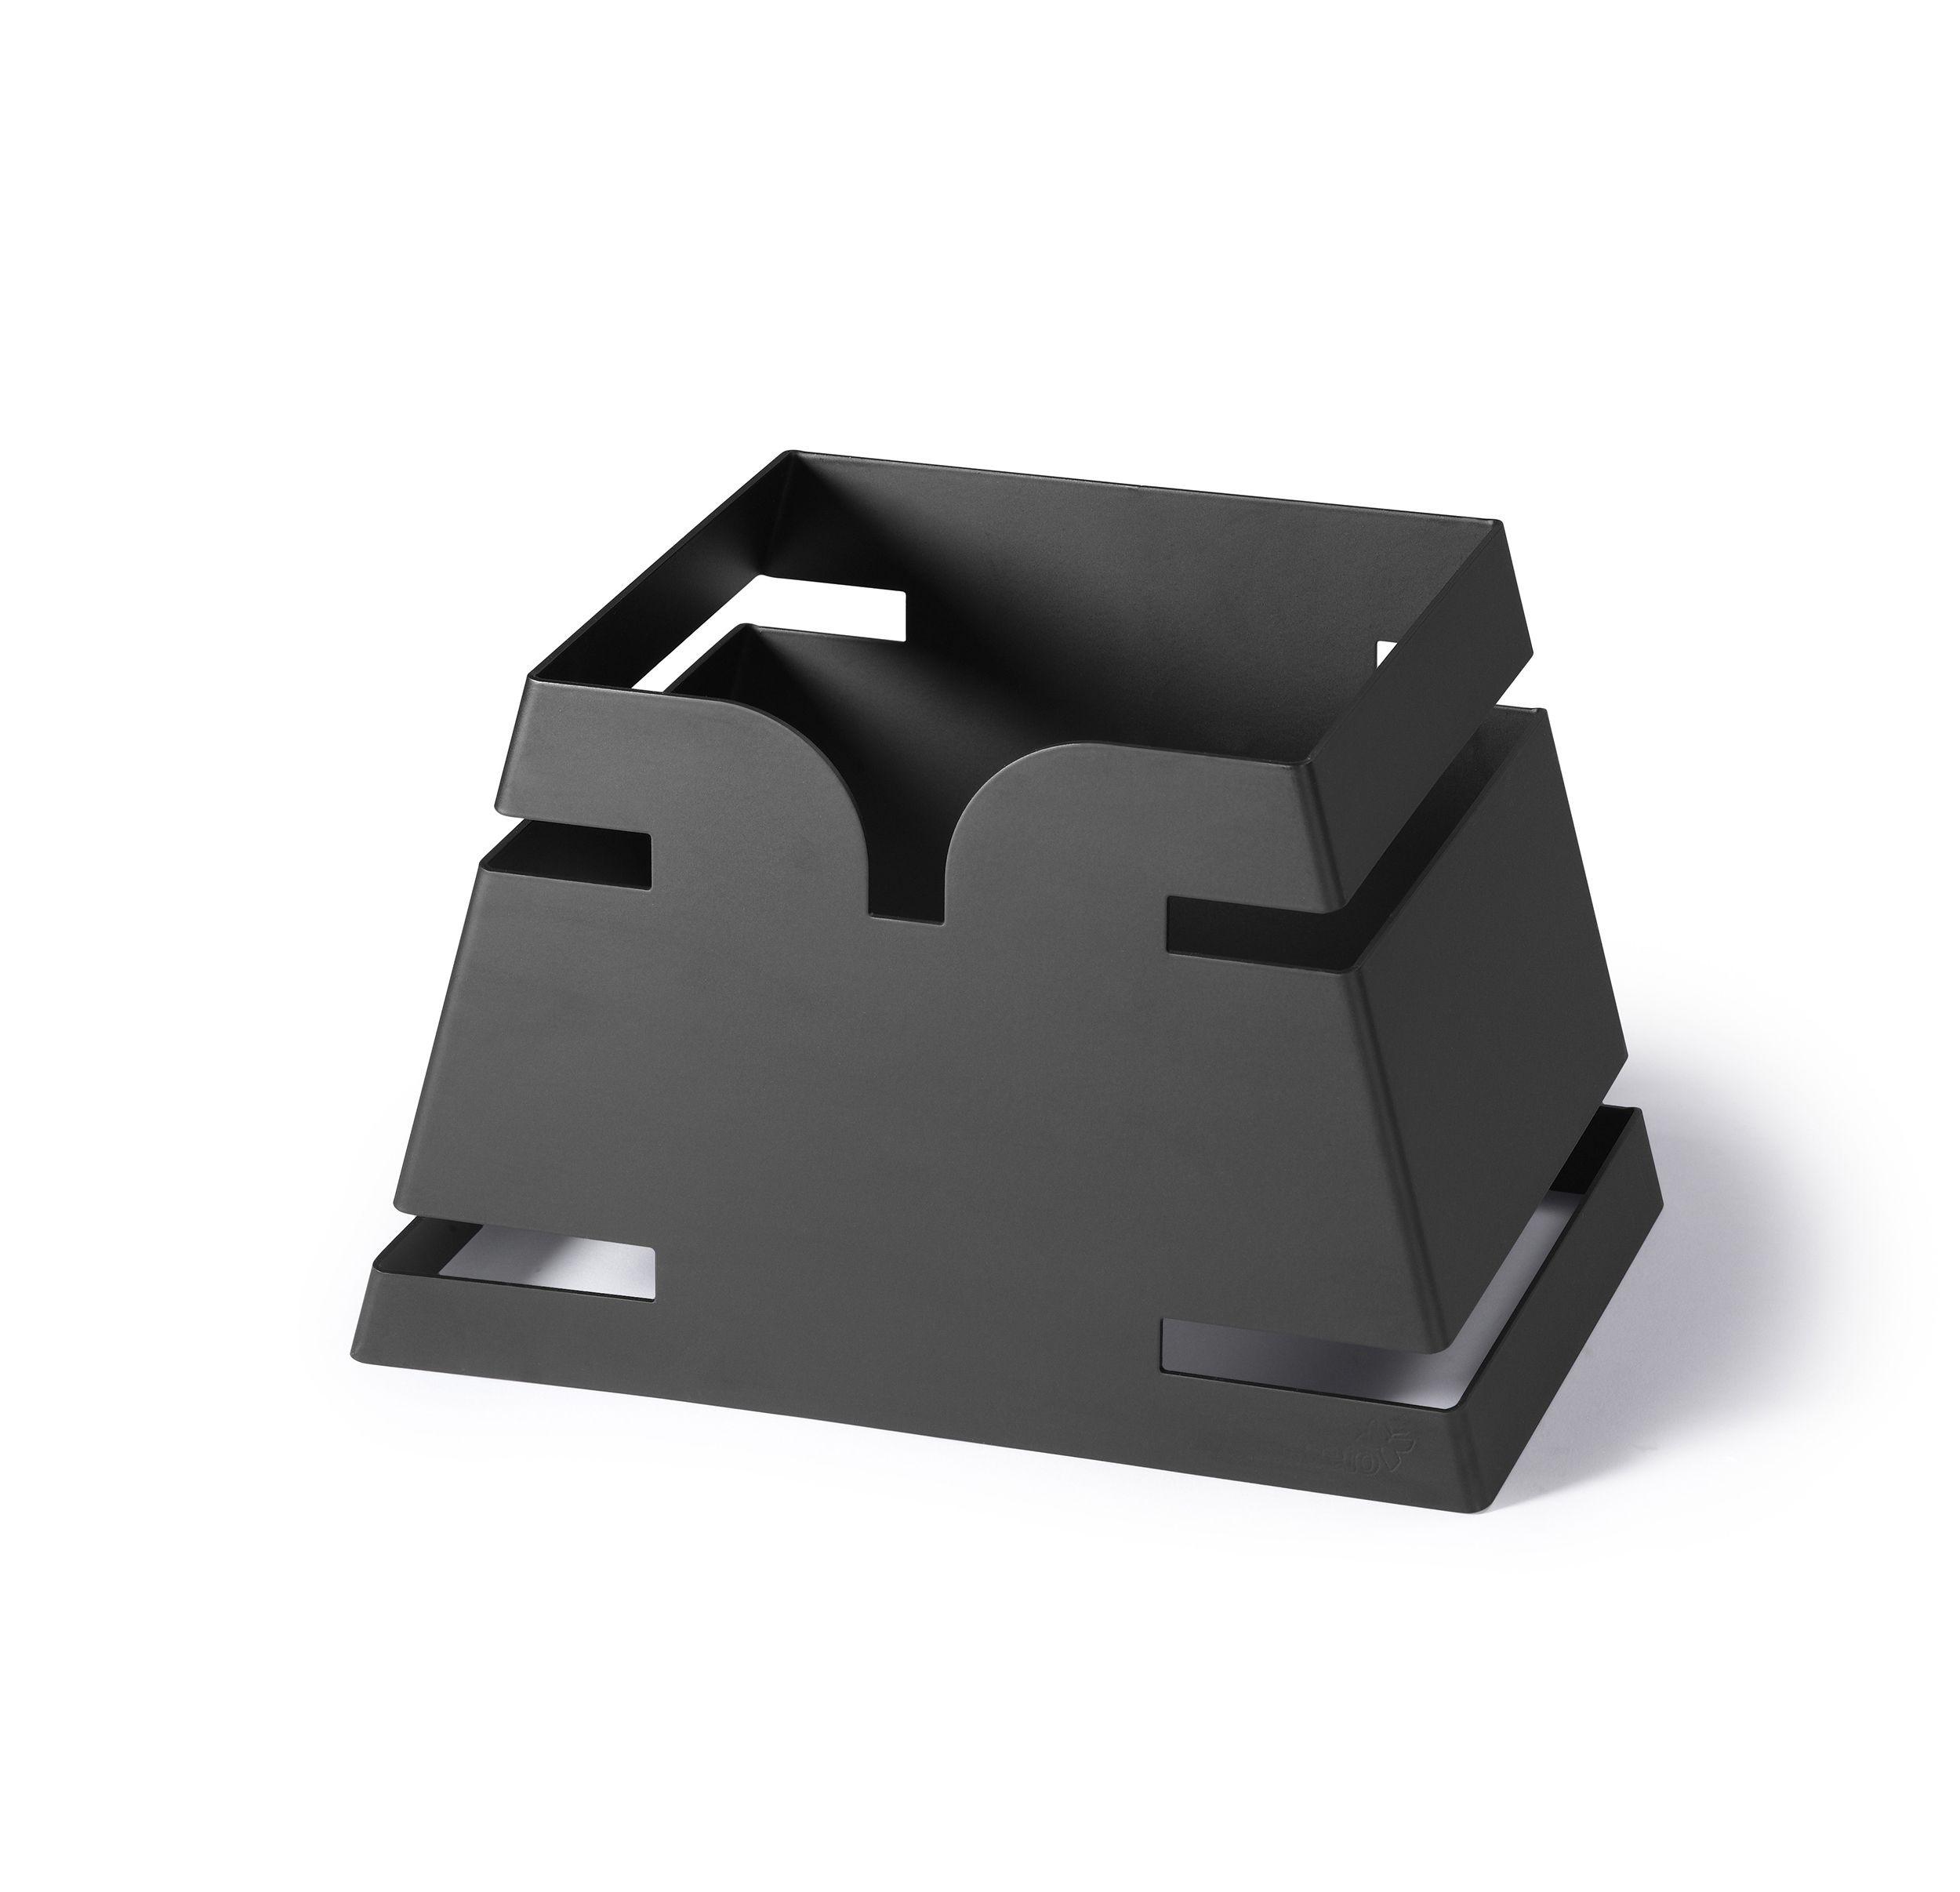 "Rosseto LD136 Large Pyramid Black Matte Skycap Riser 11.65"" x 8.3"" x 7.5""H"